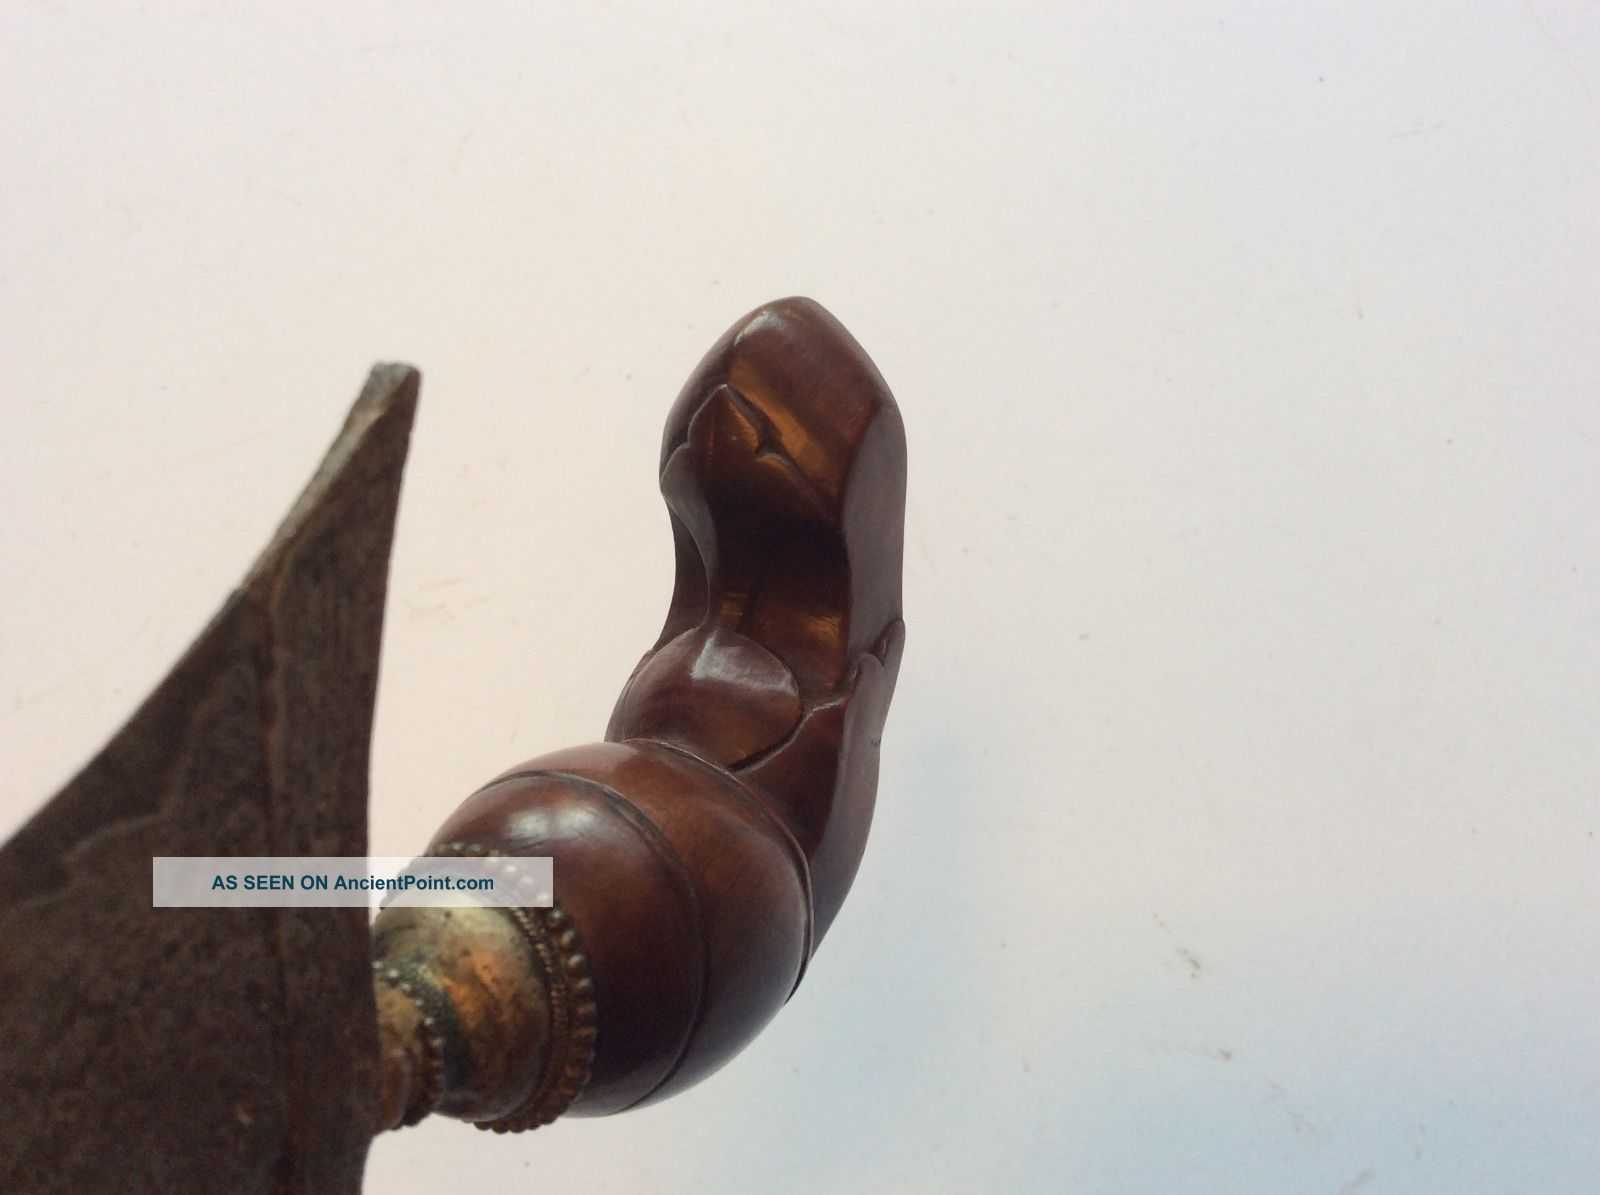 Old Antique Indonesian Sumatran Keris Kris Dagger Sword Unusual Handle Pacific Islands & Oceania photo